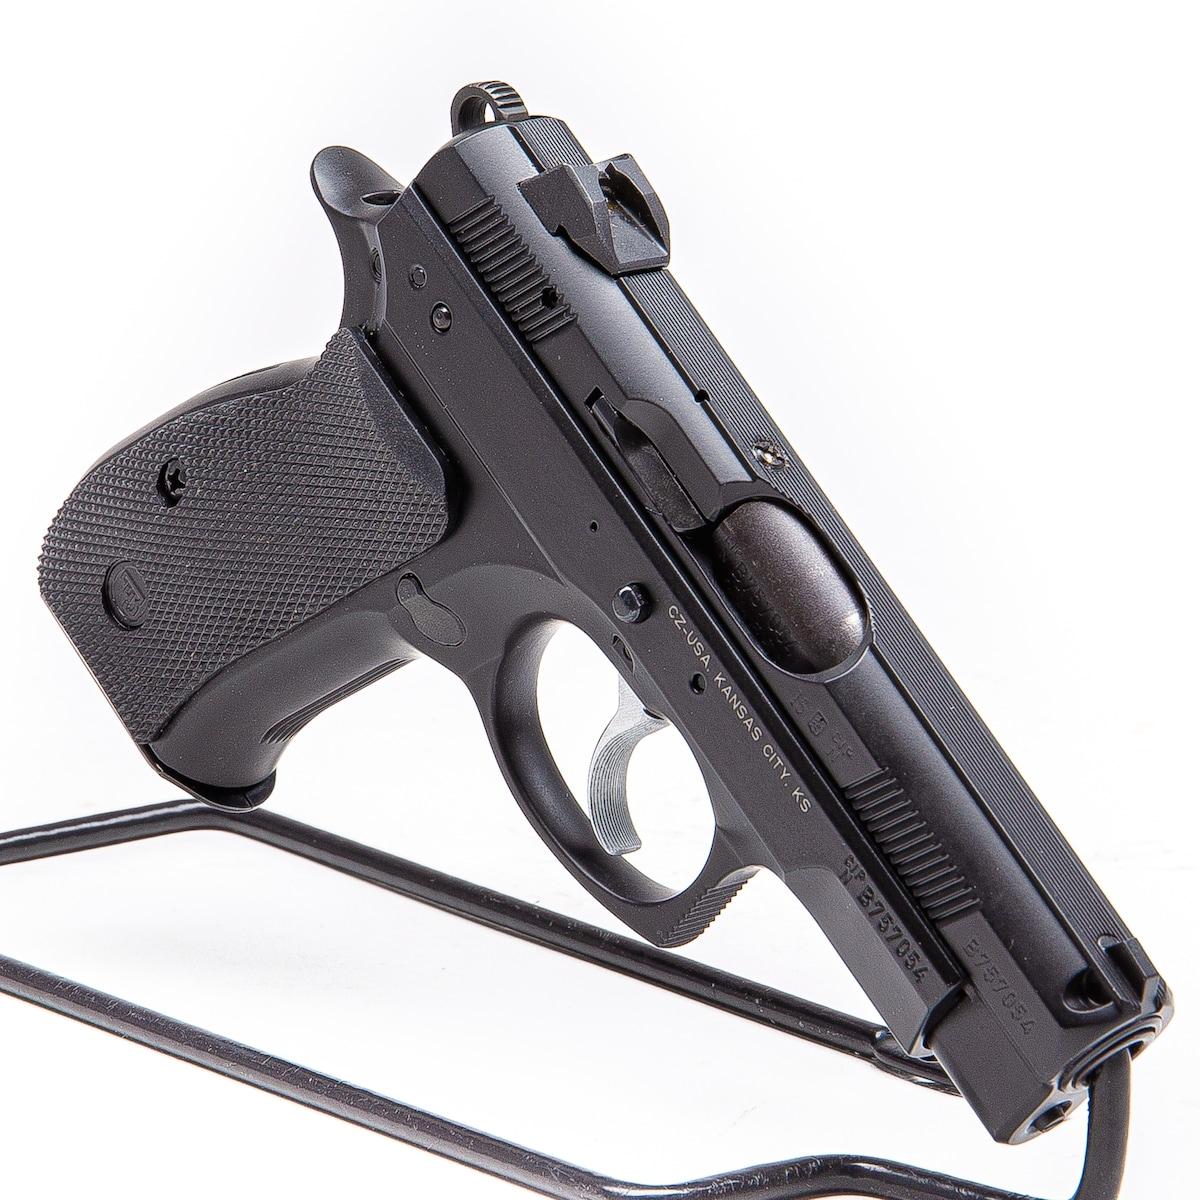 Cz 75d Compact - For Sale, Used - Excellent Condition :: Guns.com